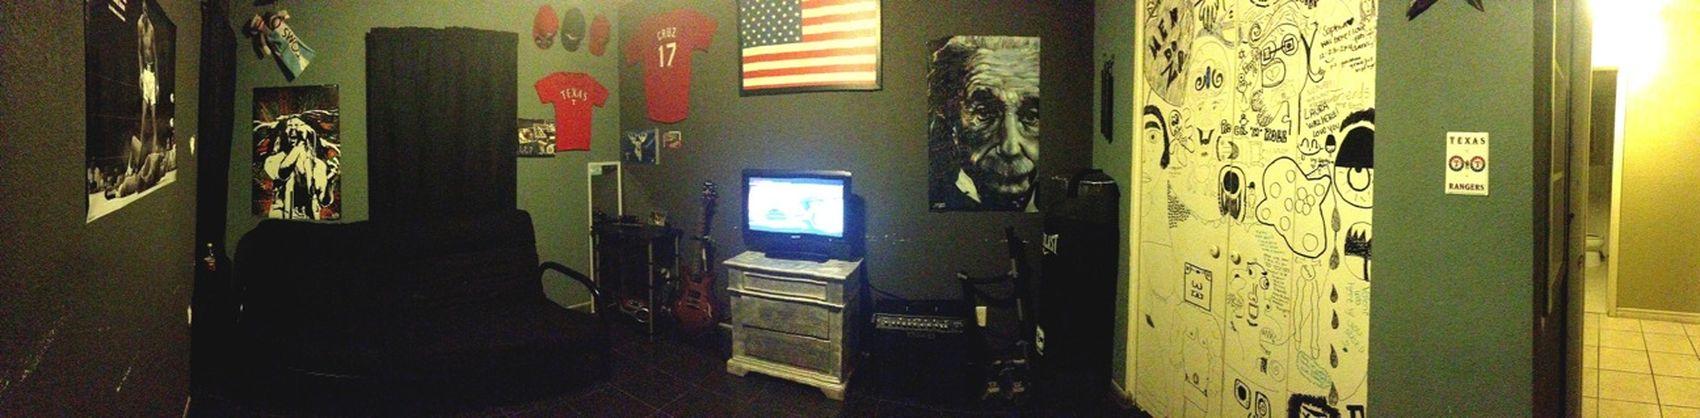 Panoramic view of my room!(: think it looks pretty badass